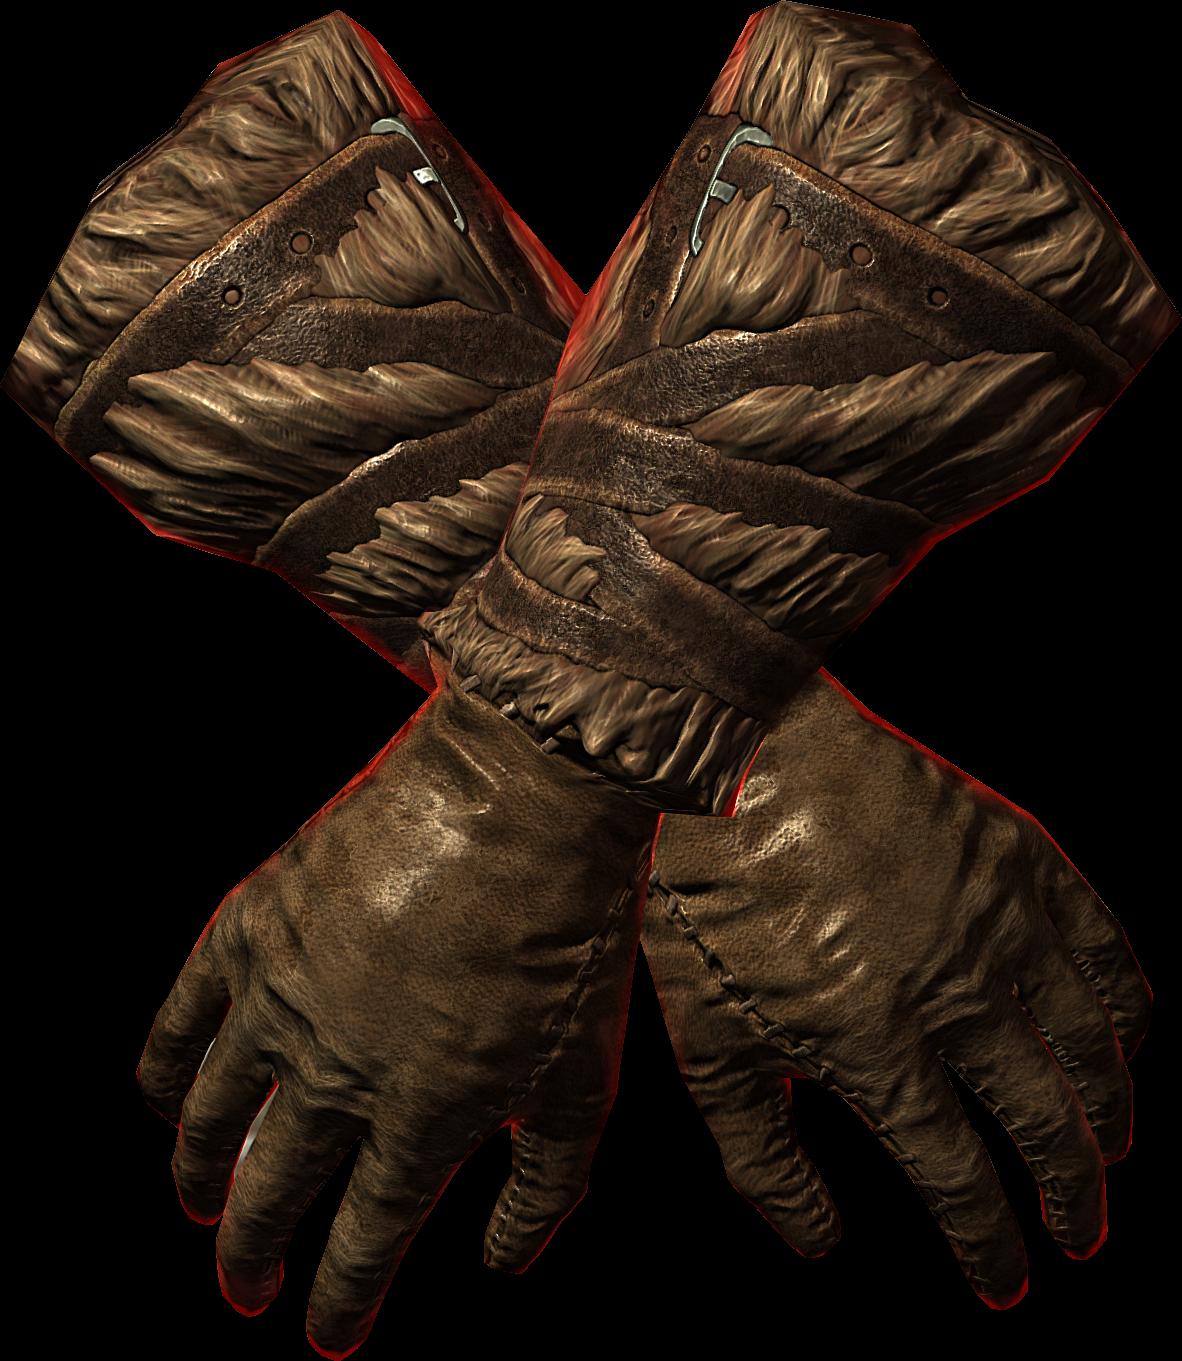 Black leather gloves skyrim - Black Leather Gloves Skyrim 9